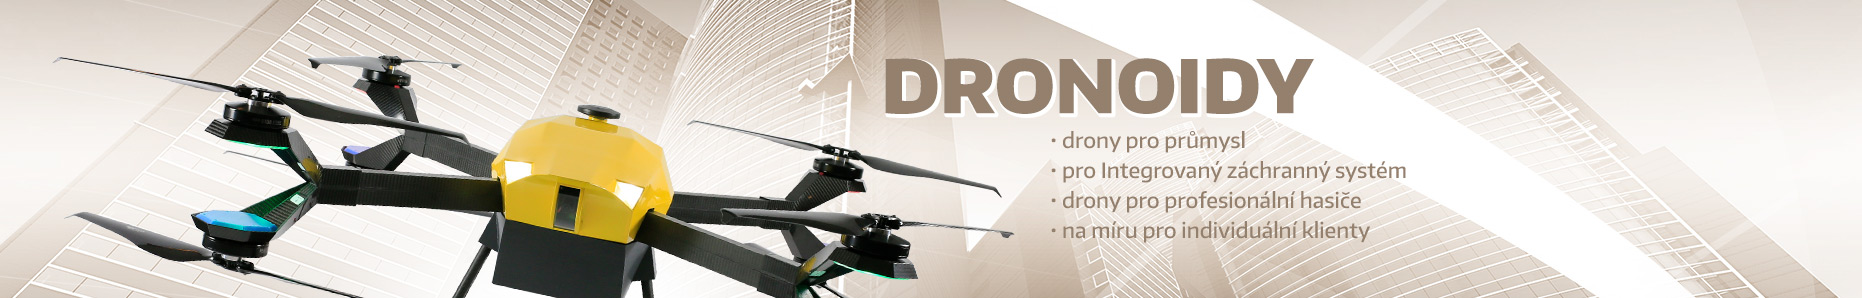 Dronoidy - drony pro profesionály